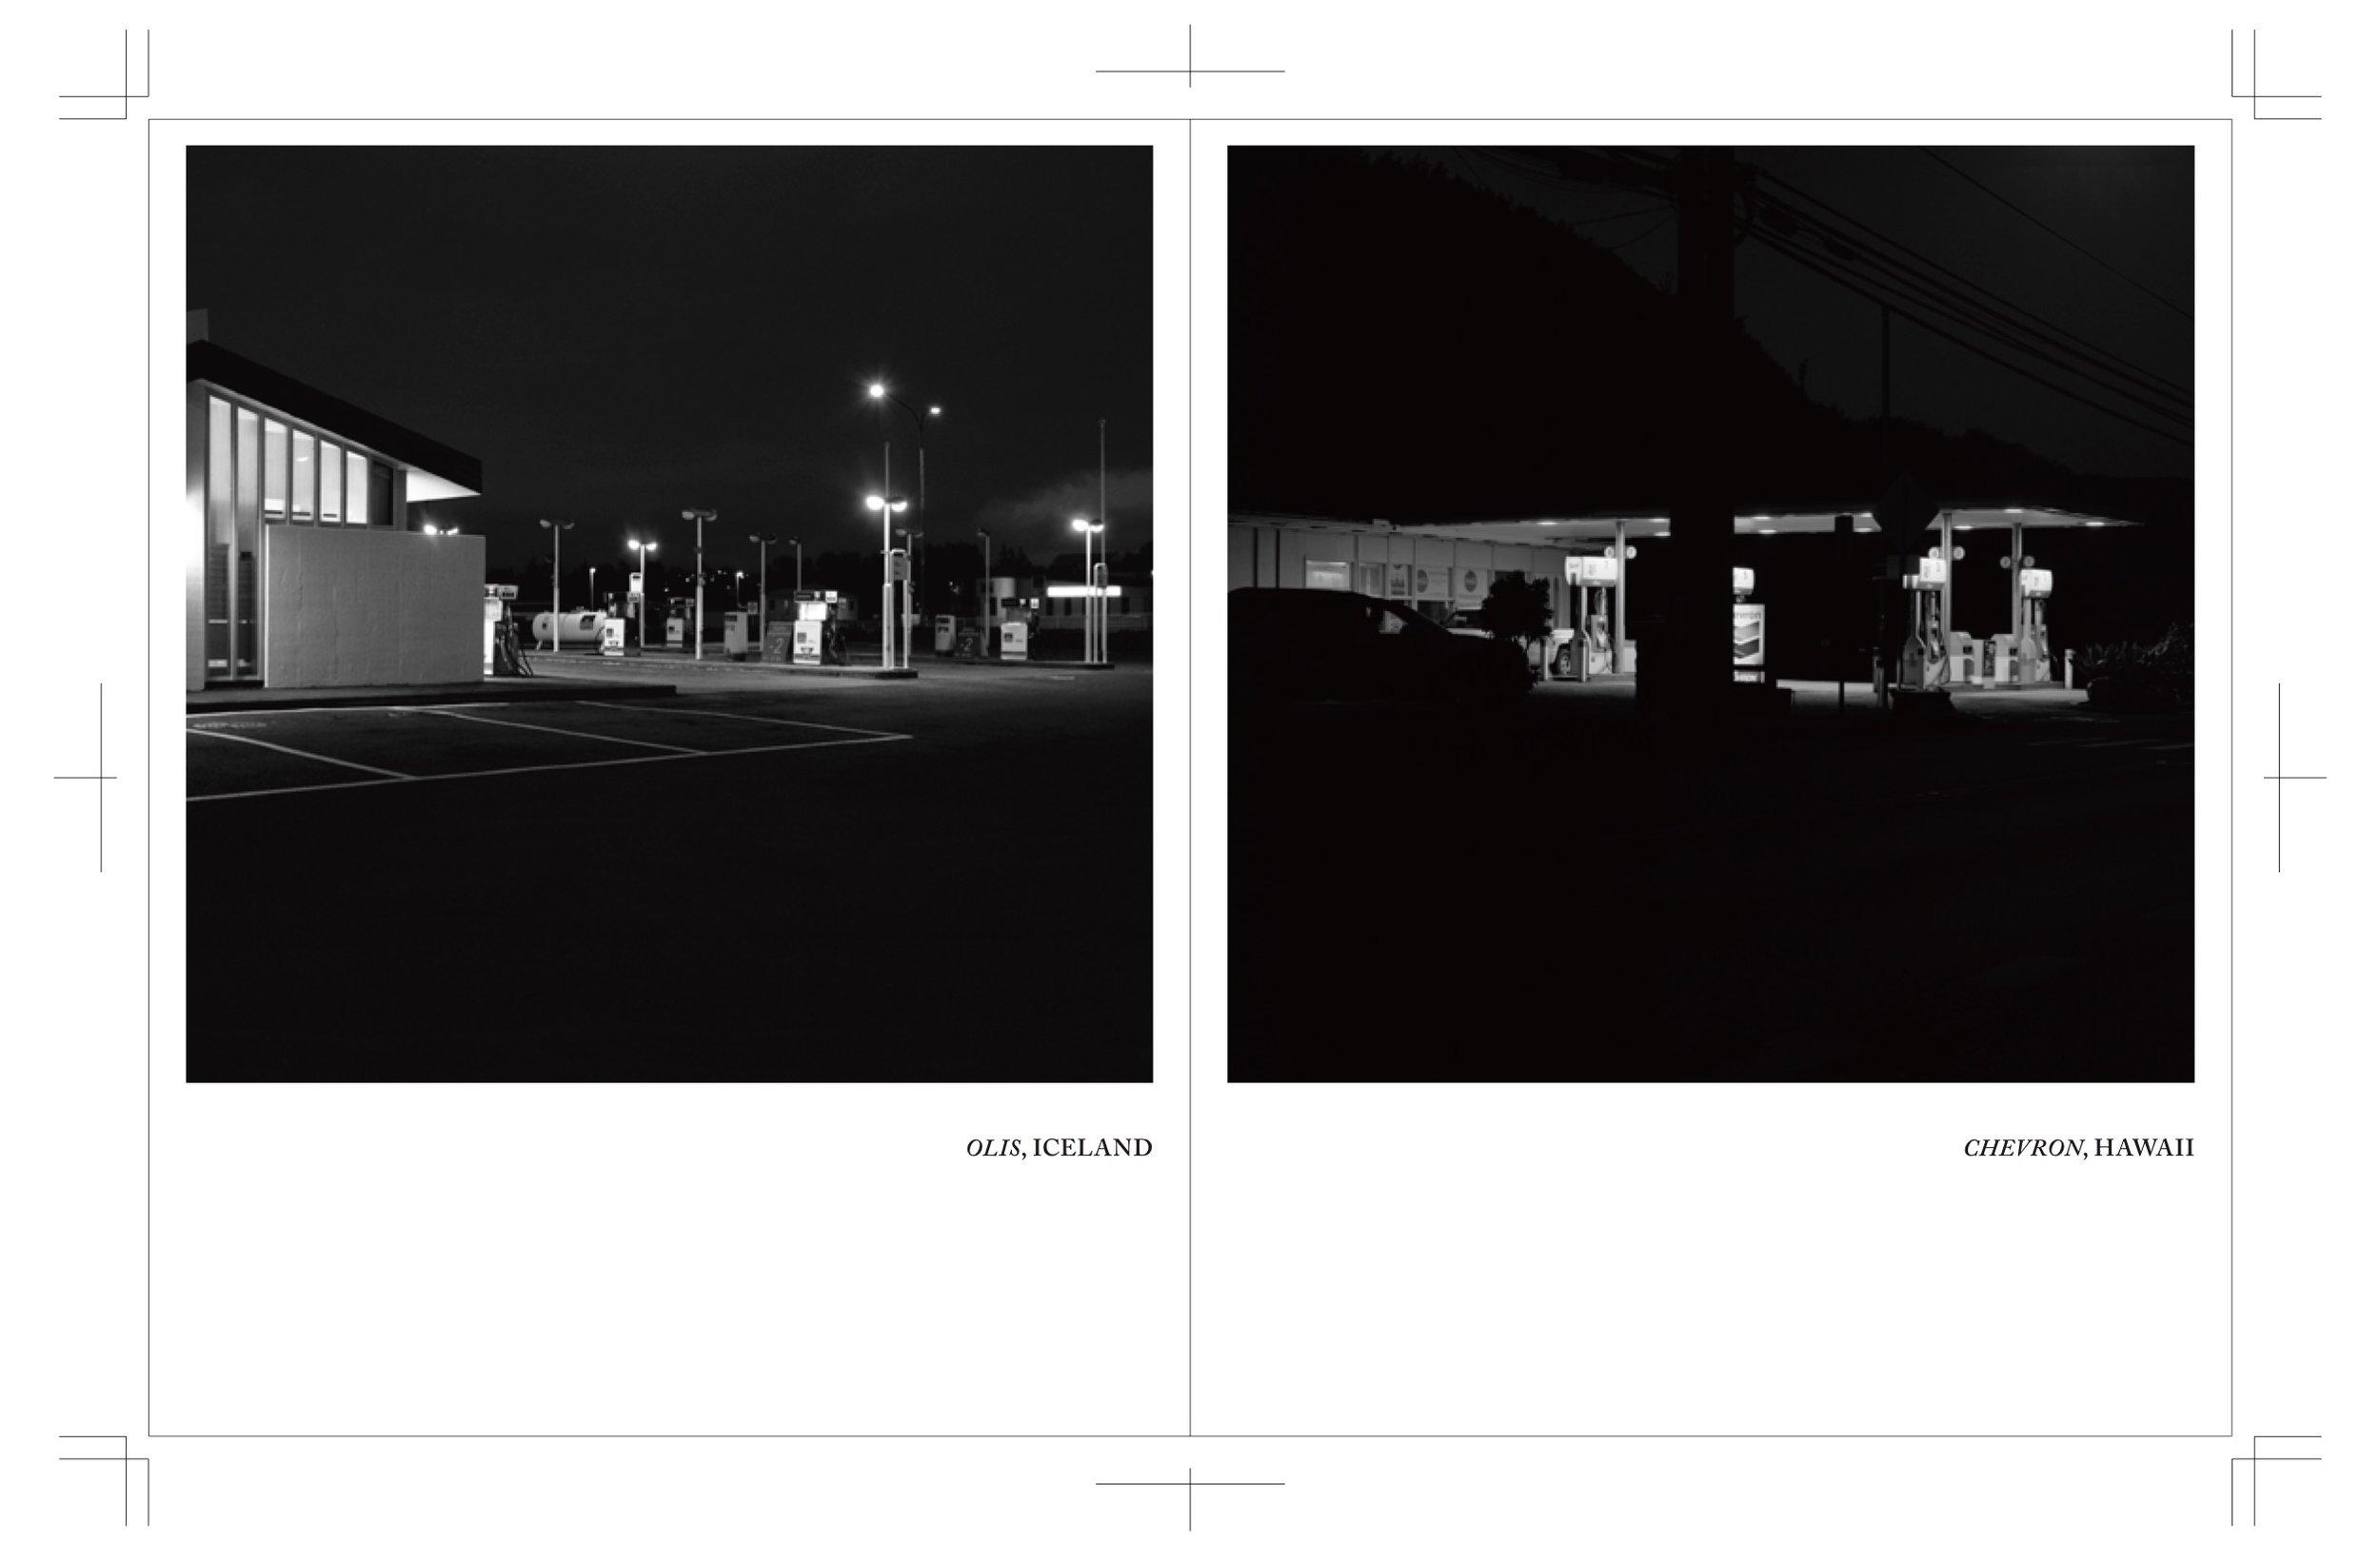 gasoline_01 18.jpeg